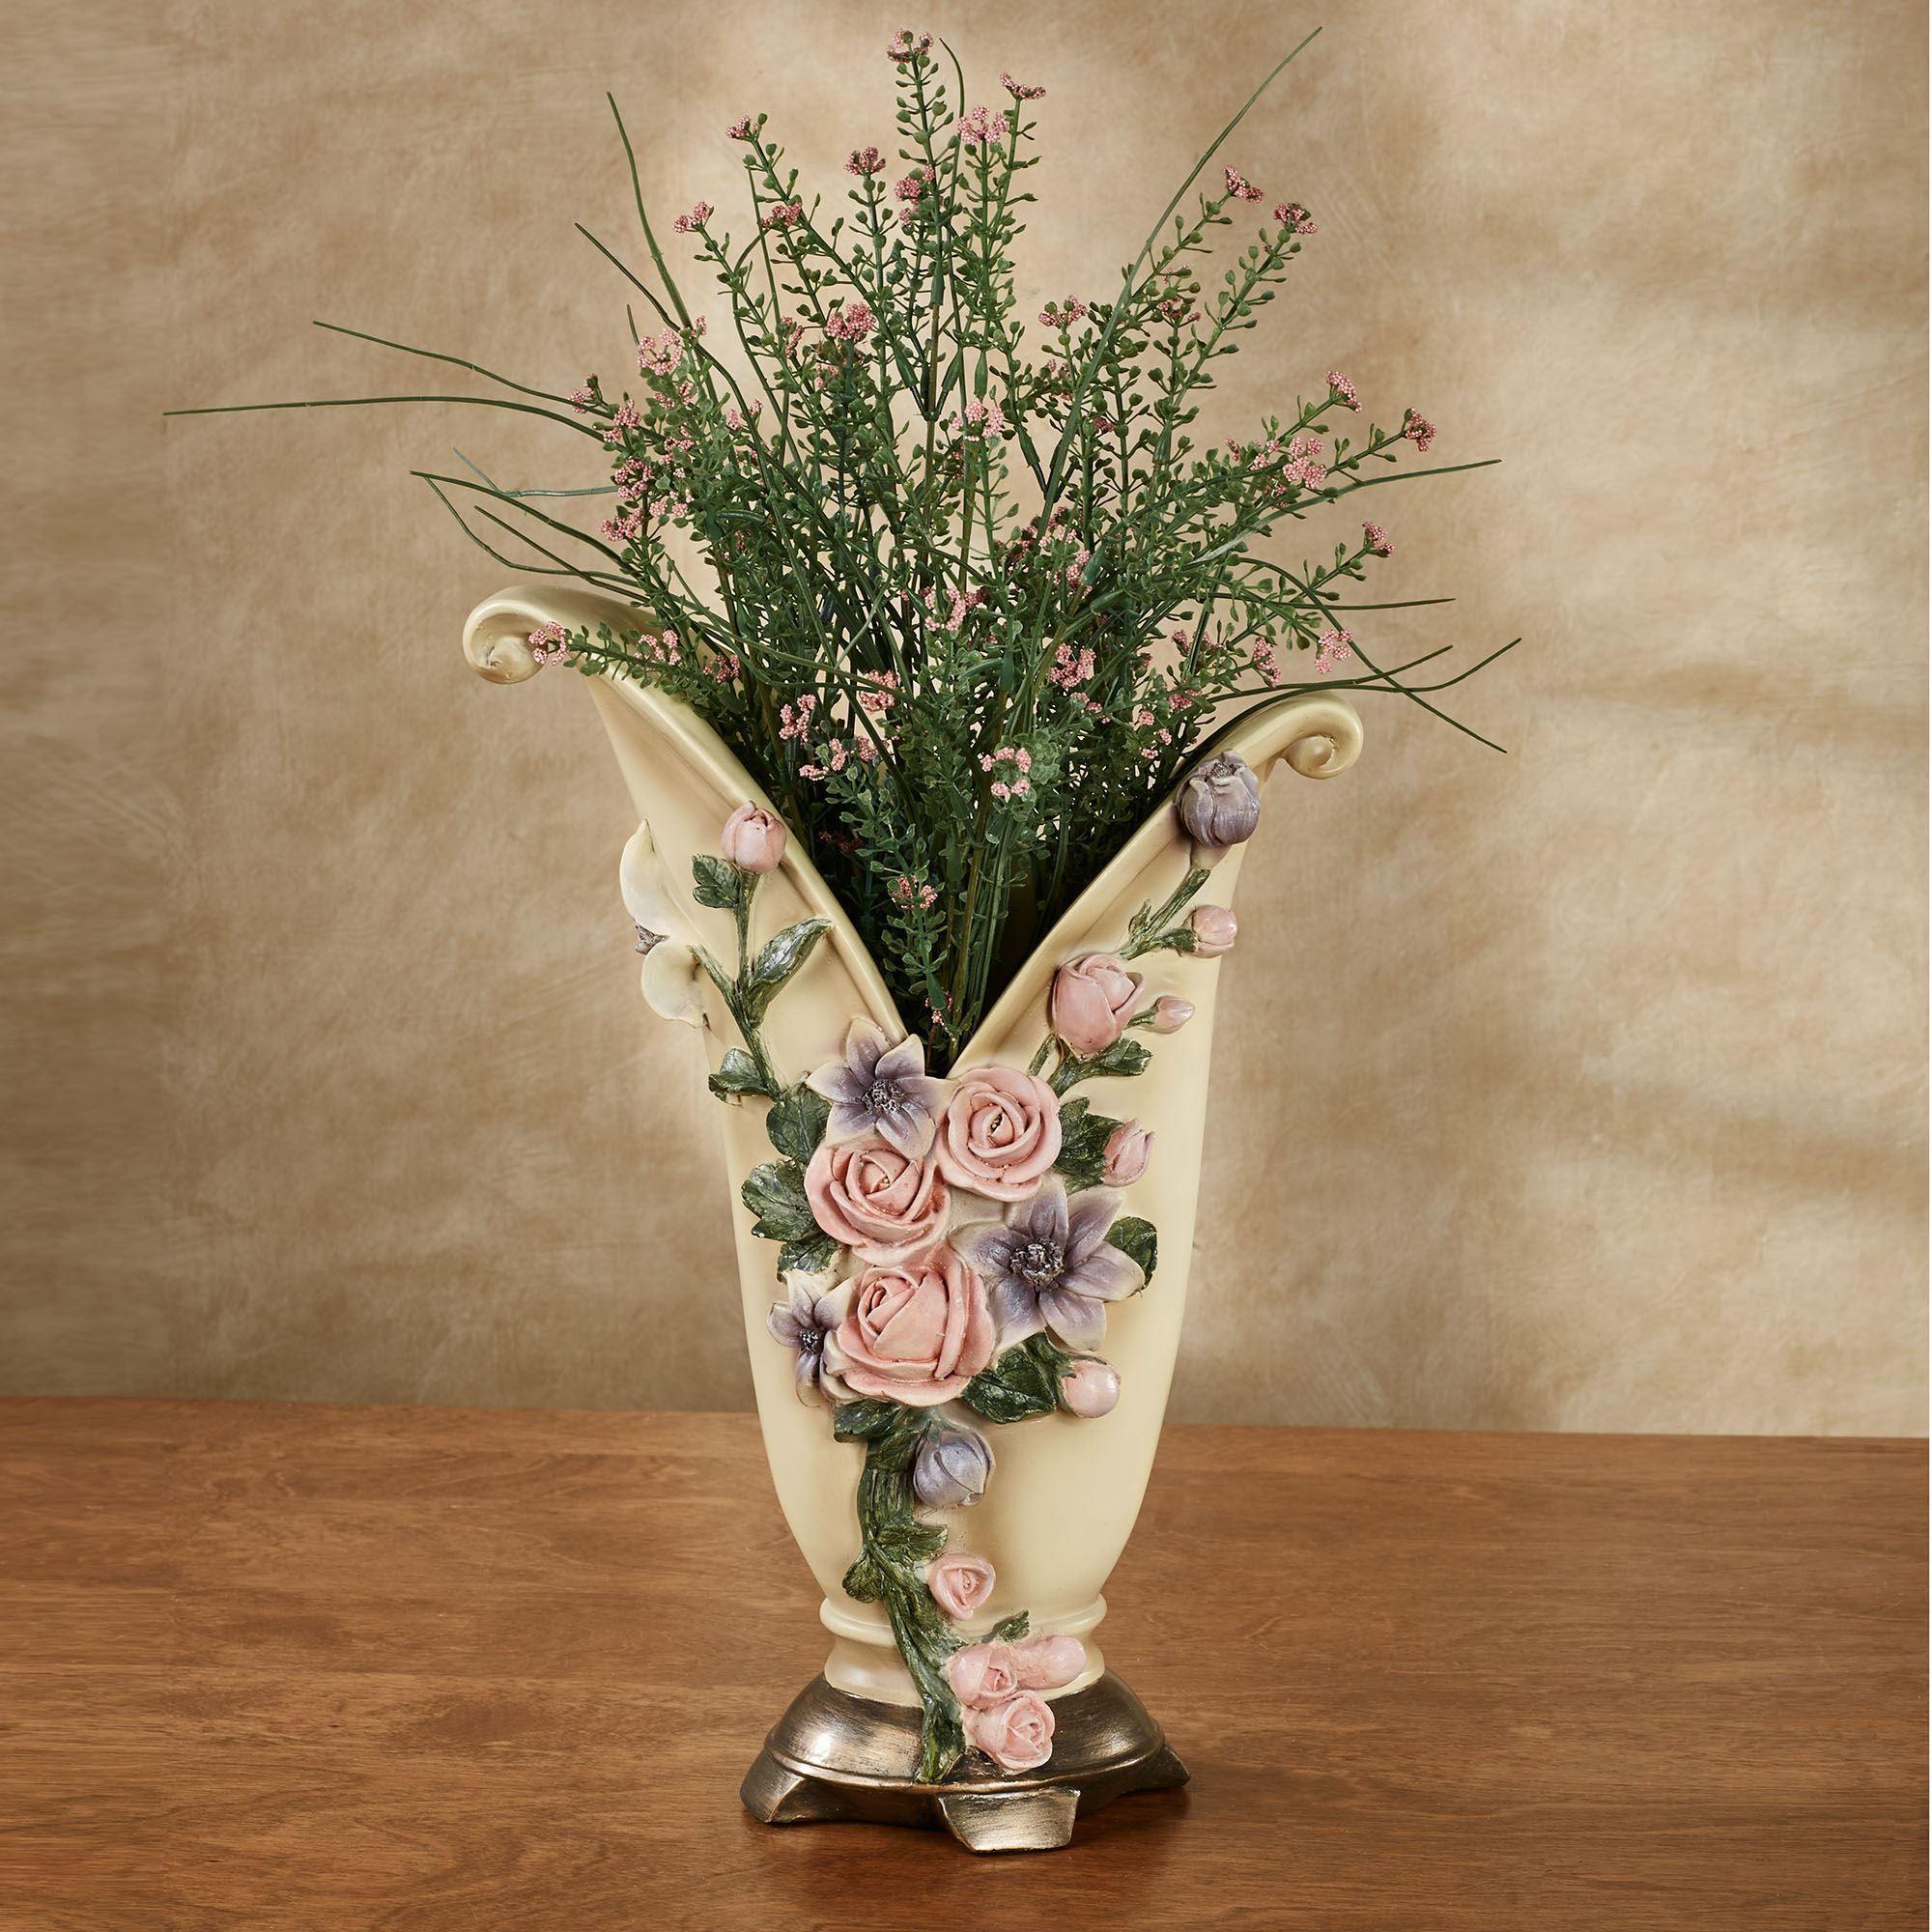 Summer Florals Decorative Table Vase